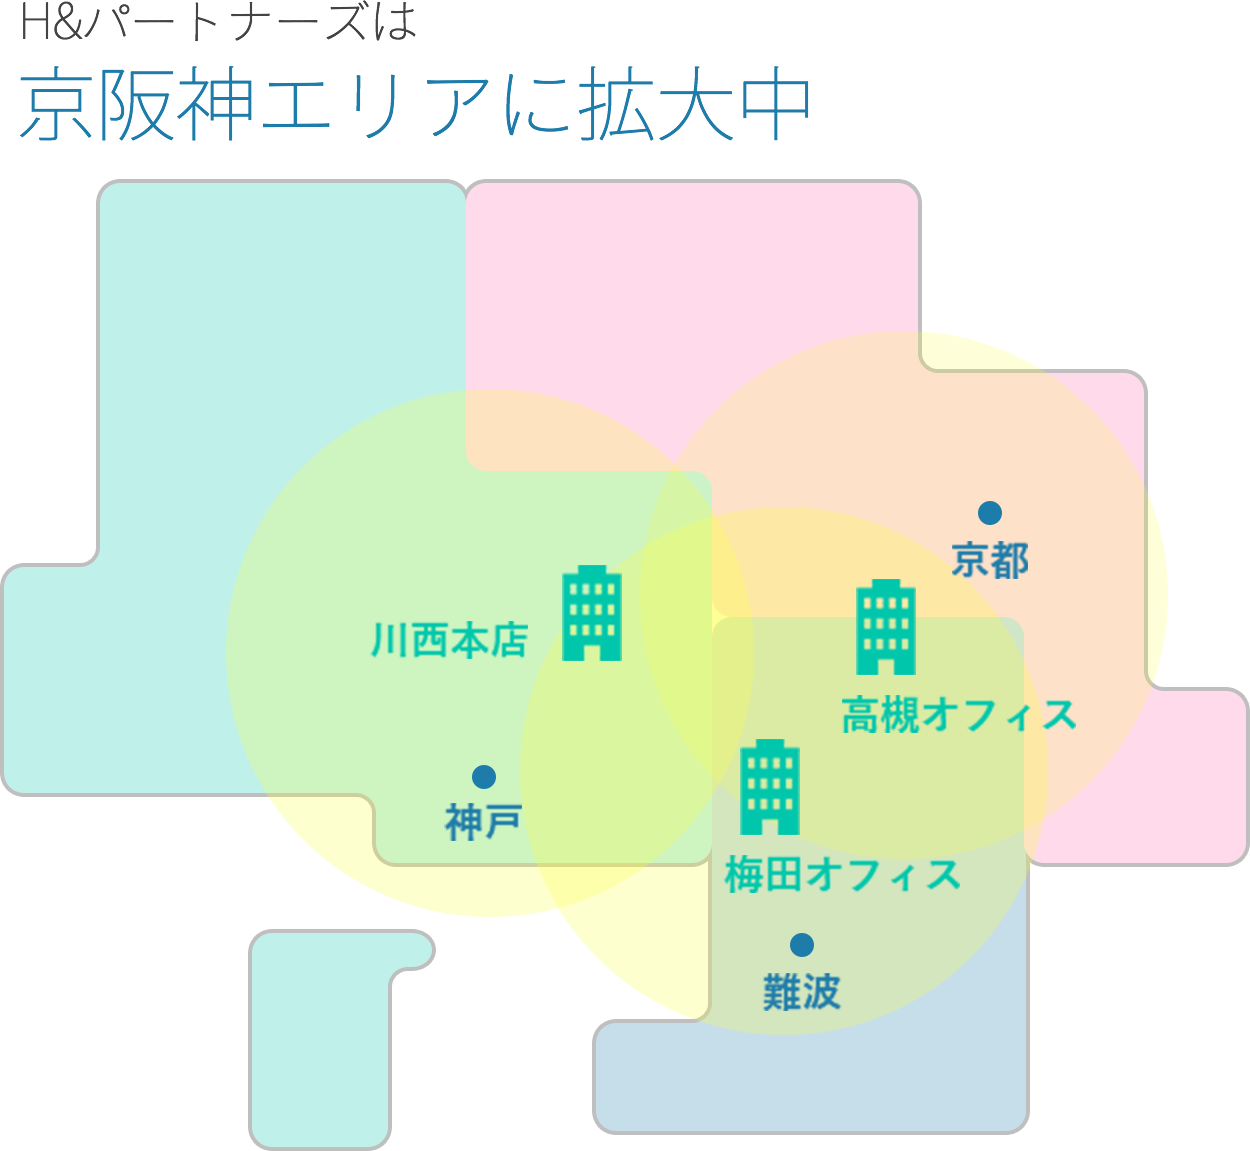 H&パートナーズは京阪神エリアに拡大中